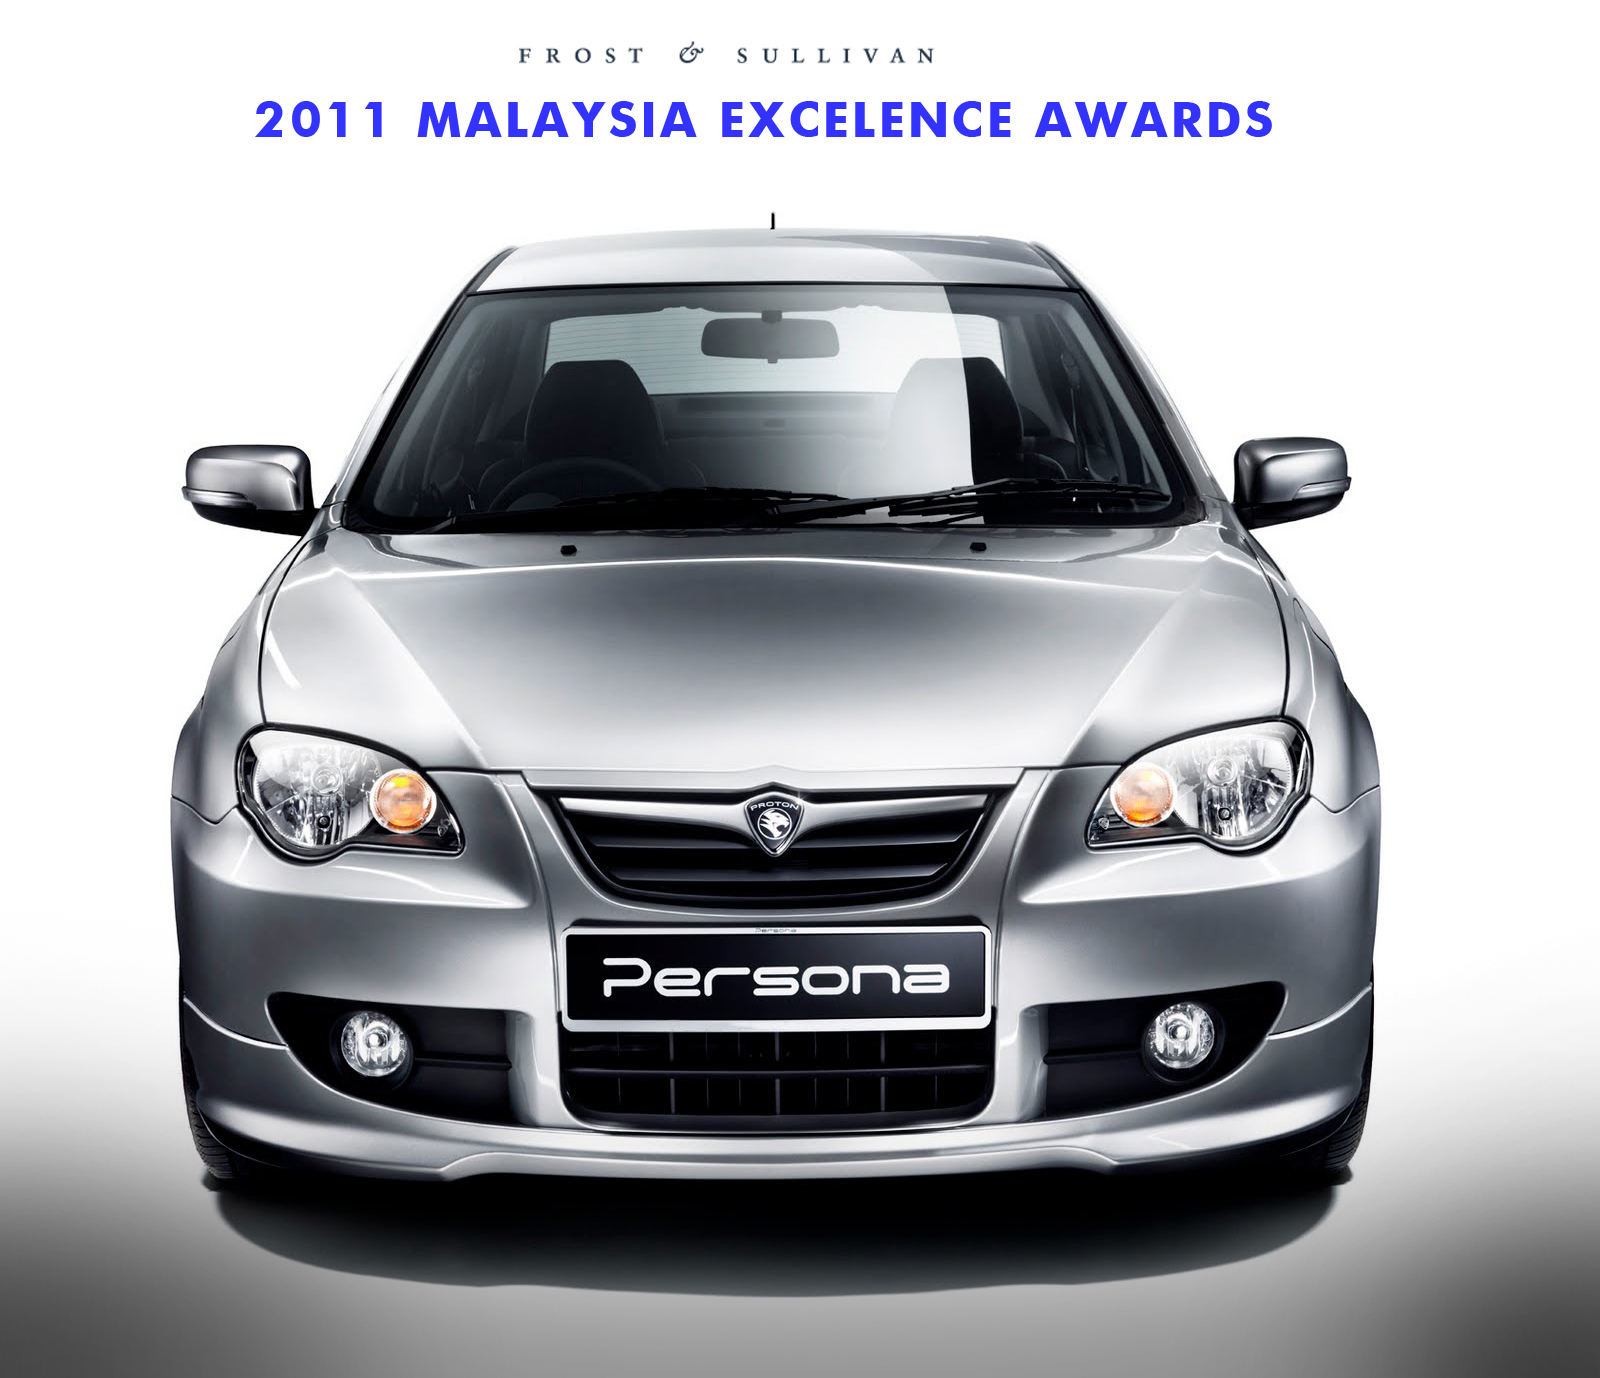 Proton Car Wallpaper: BMW I3 WALLPARERS: Proton Persona Wins Frost & Sullivan